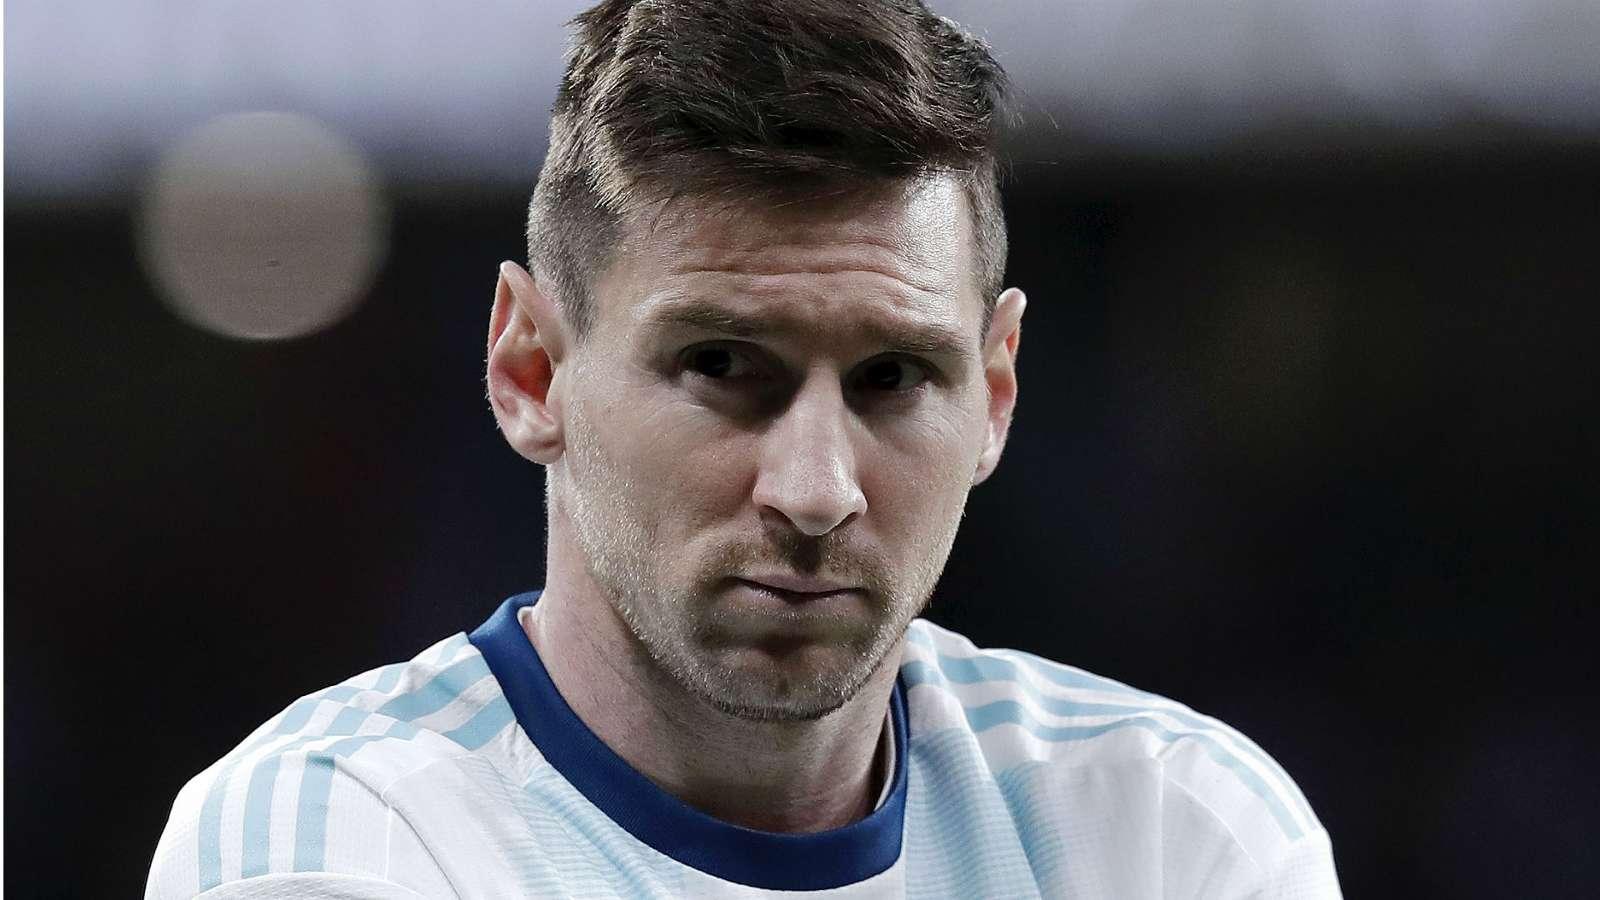 ARGENTINA 1 VENEZUELA 3: MESSI STUNNED ON INTERNATIONAL RETURN